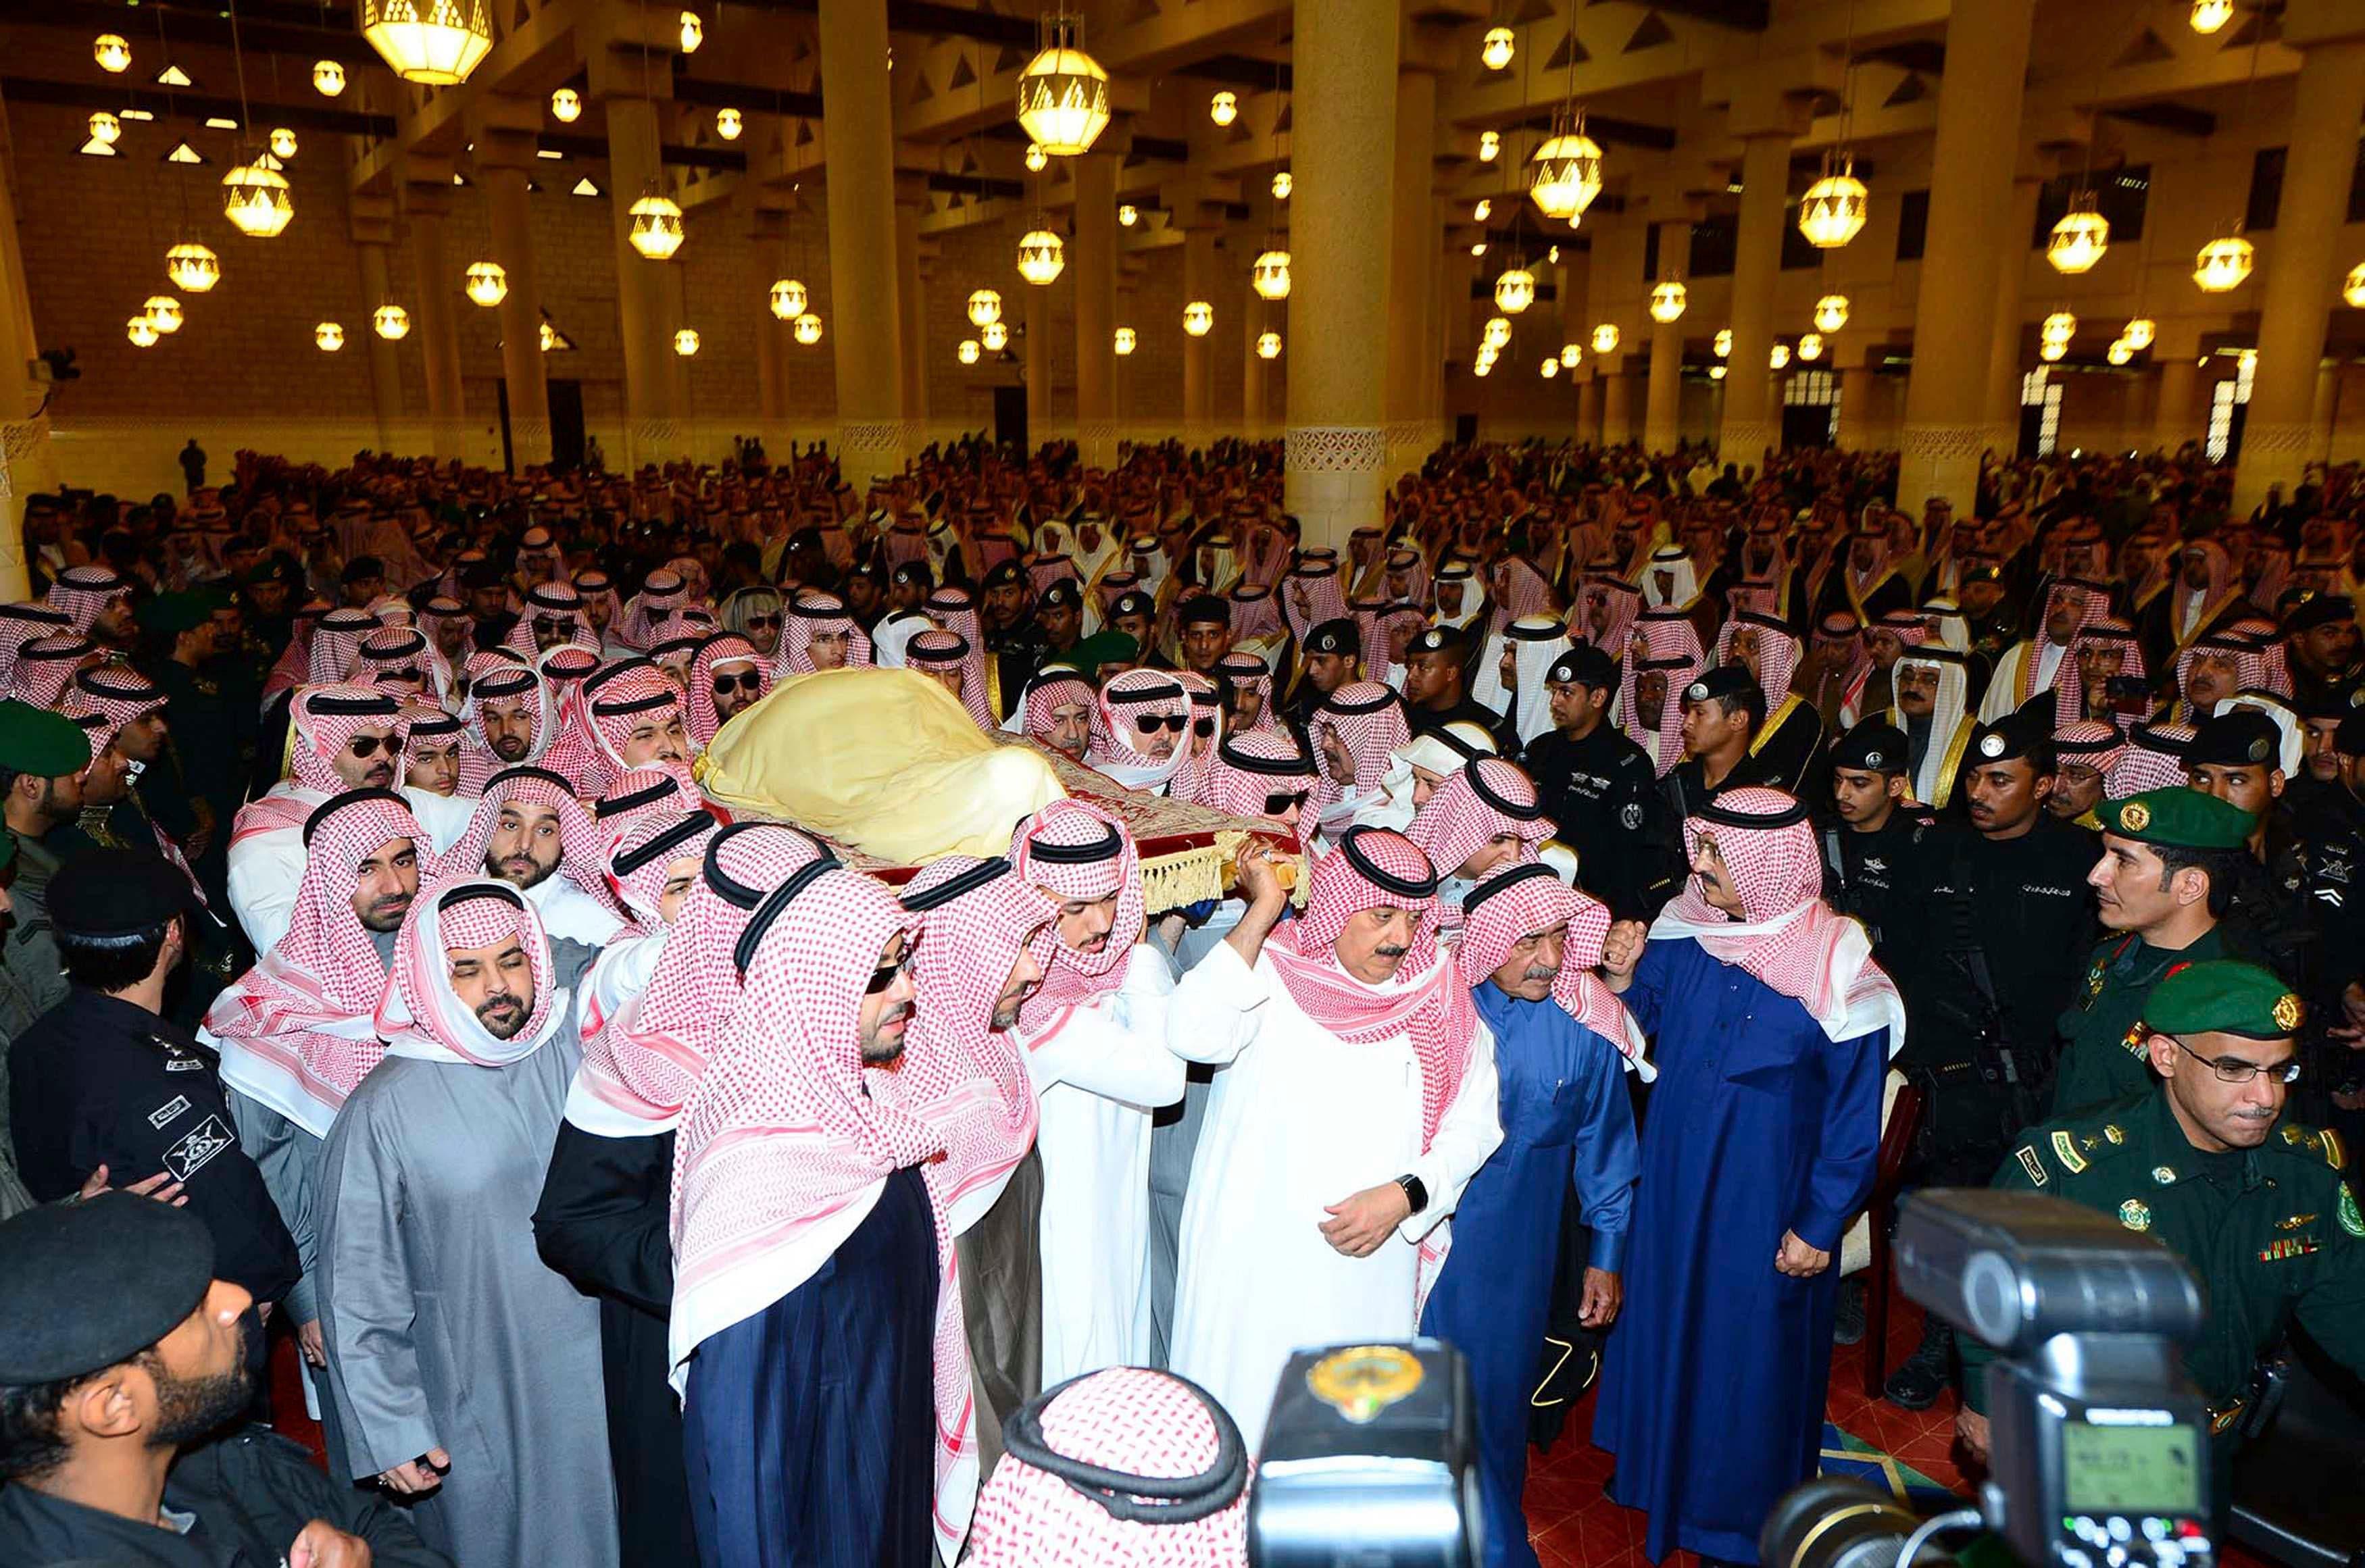 The body of Saudi King Abdullah is carried during his funeral at Imam Turki Bin Abdullah Grand Mosque in Riyadh Jan. 23, 2015 (Reuters)